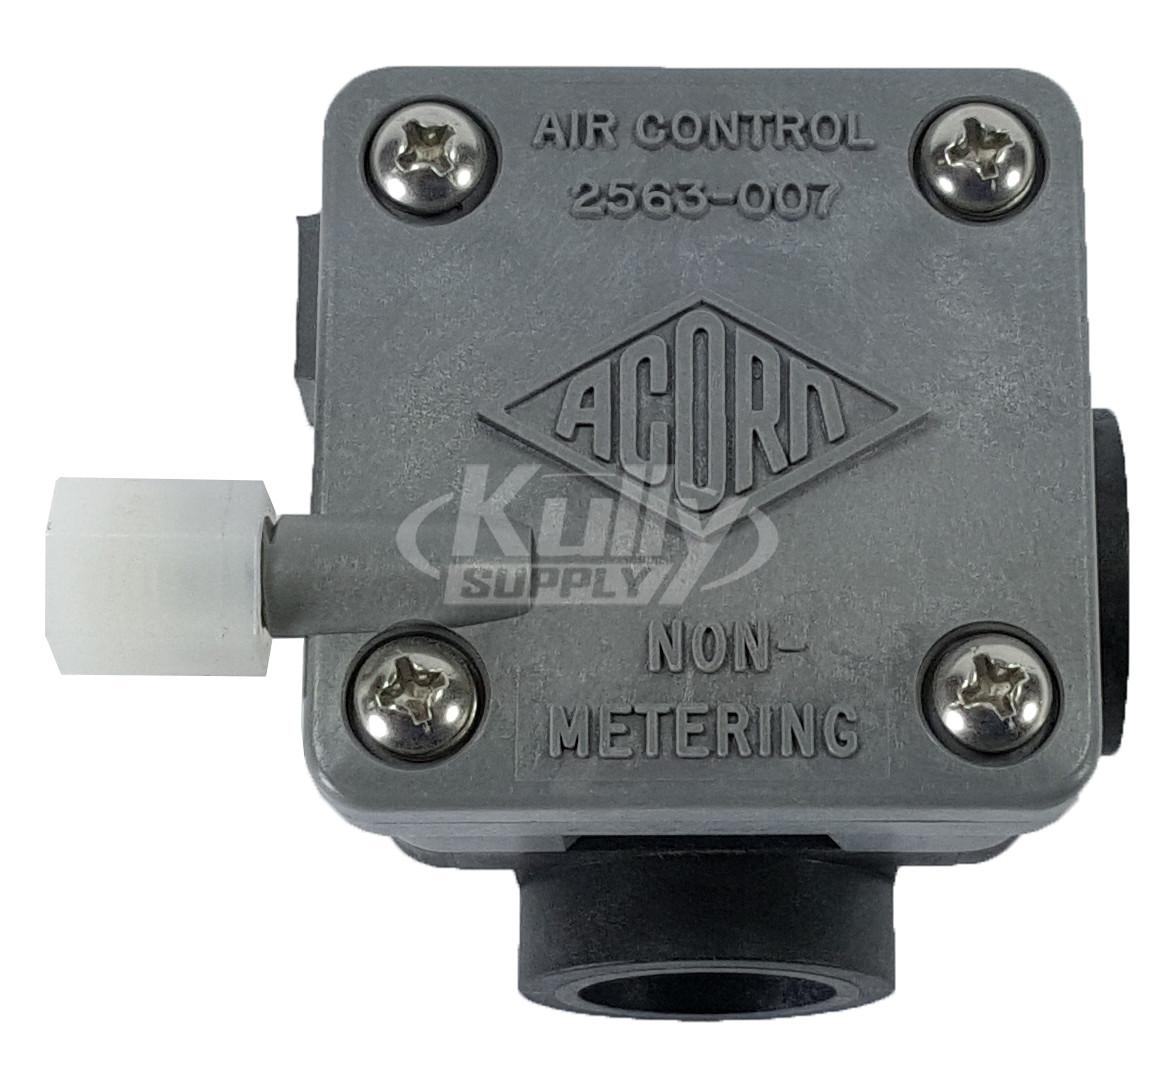 Acorn 2570 101 001 Non Metering Right Hand Air Control